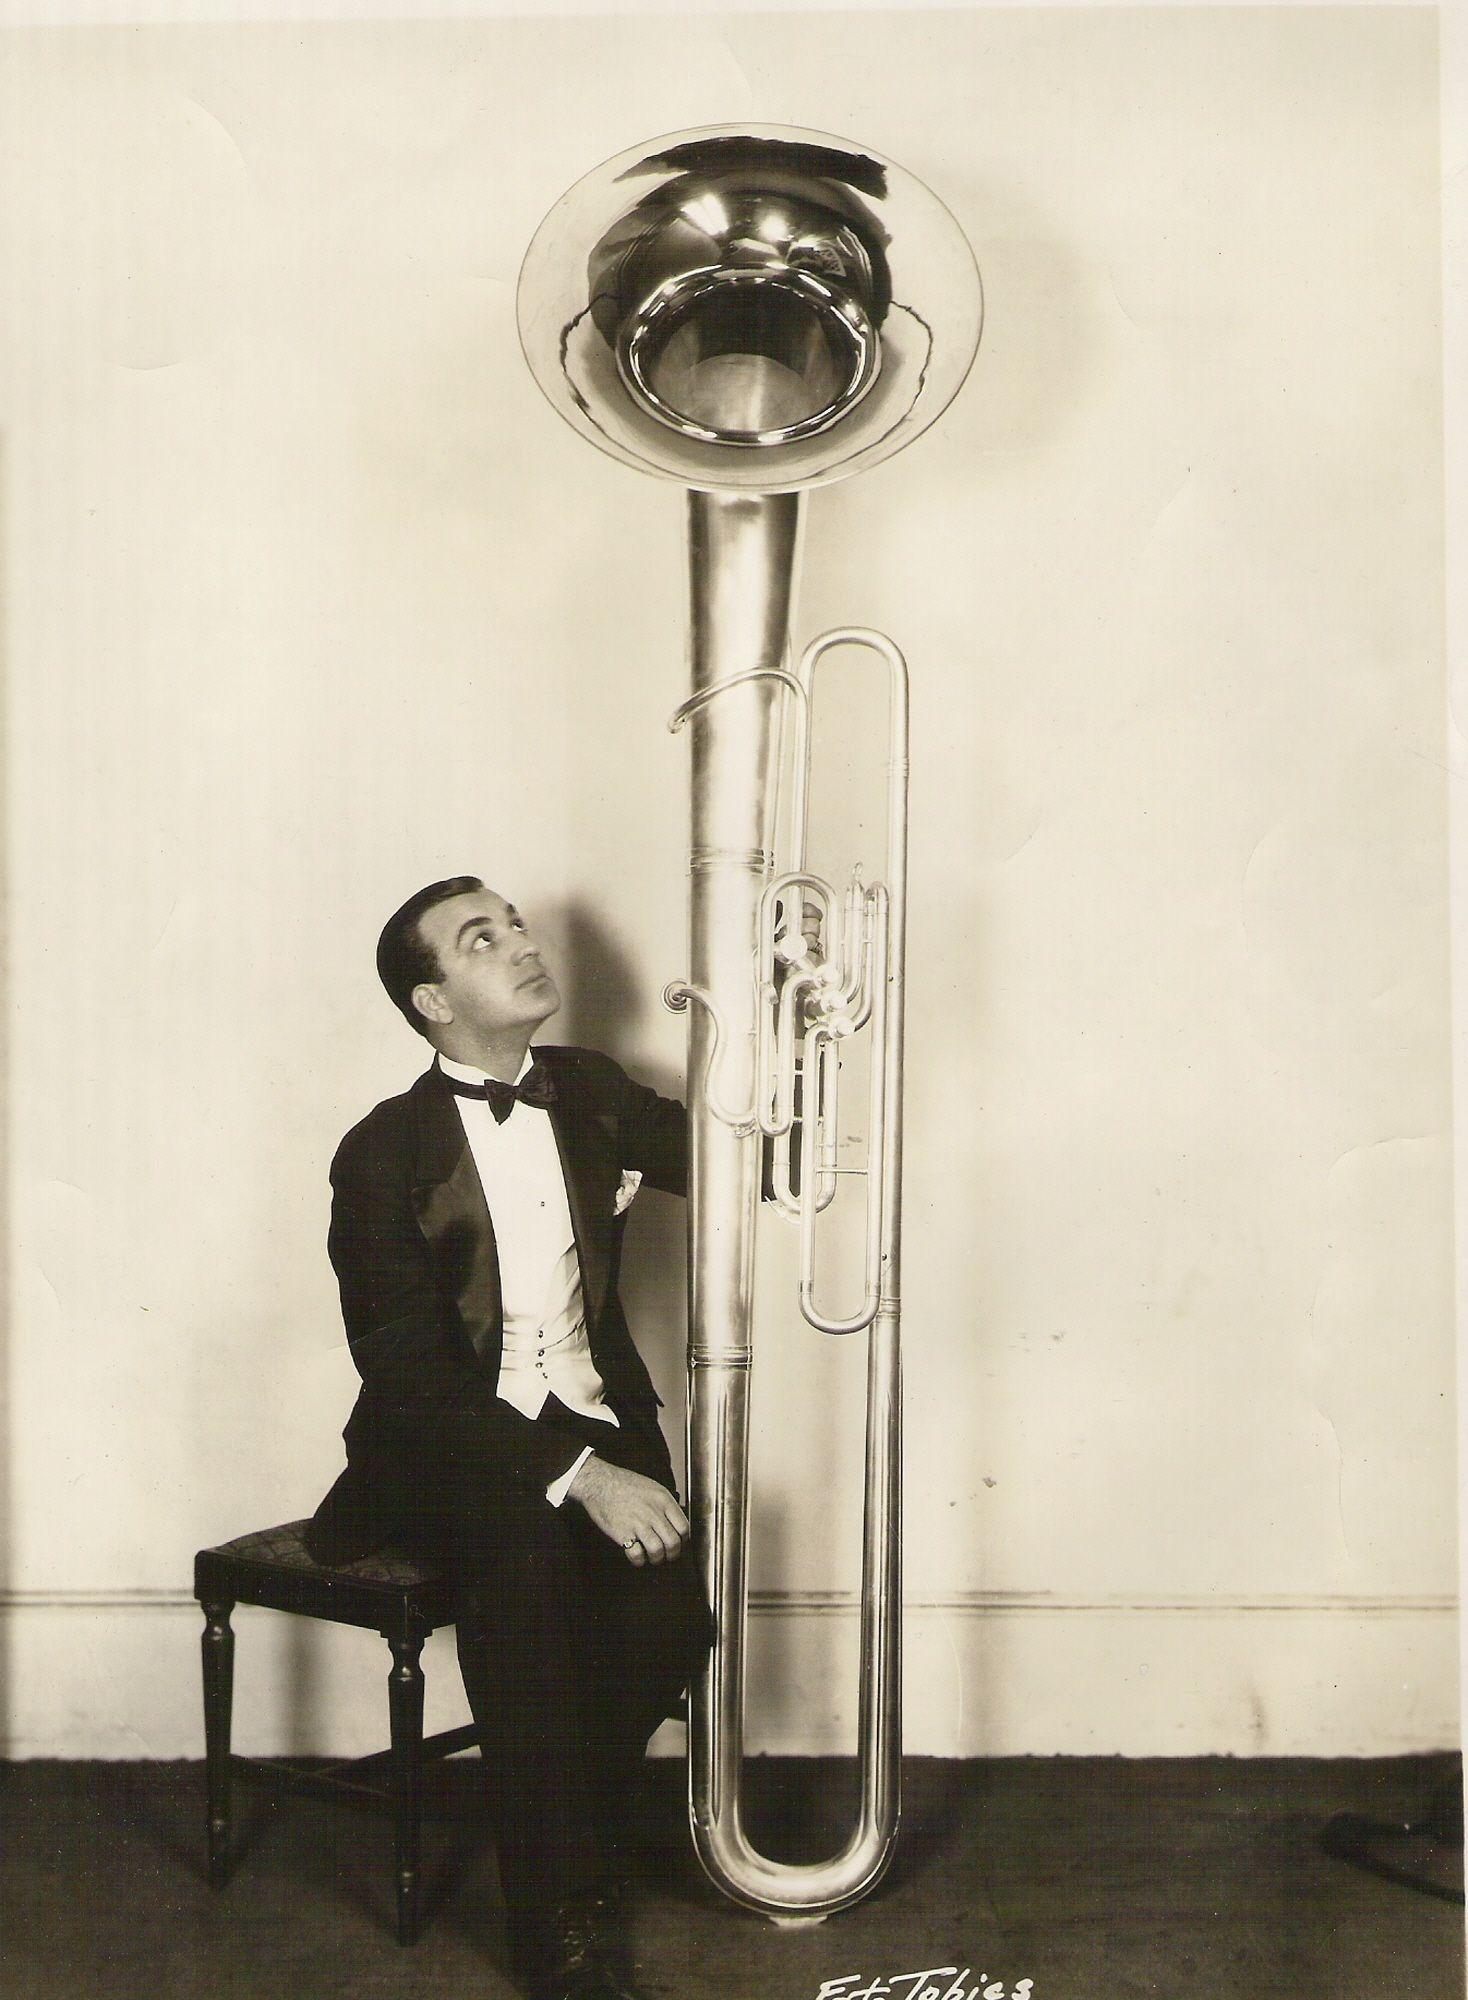 In the 1920s prominent tubist Joe Tarto had an 8 foot tall